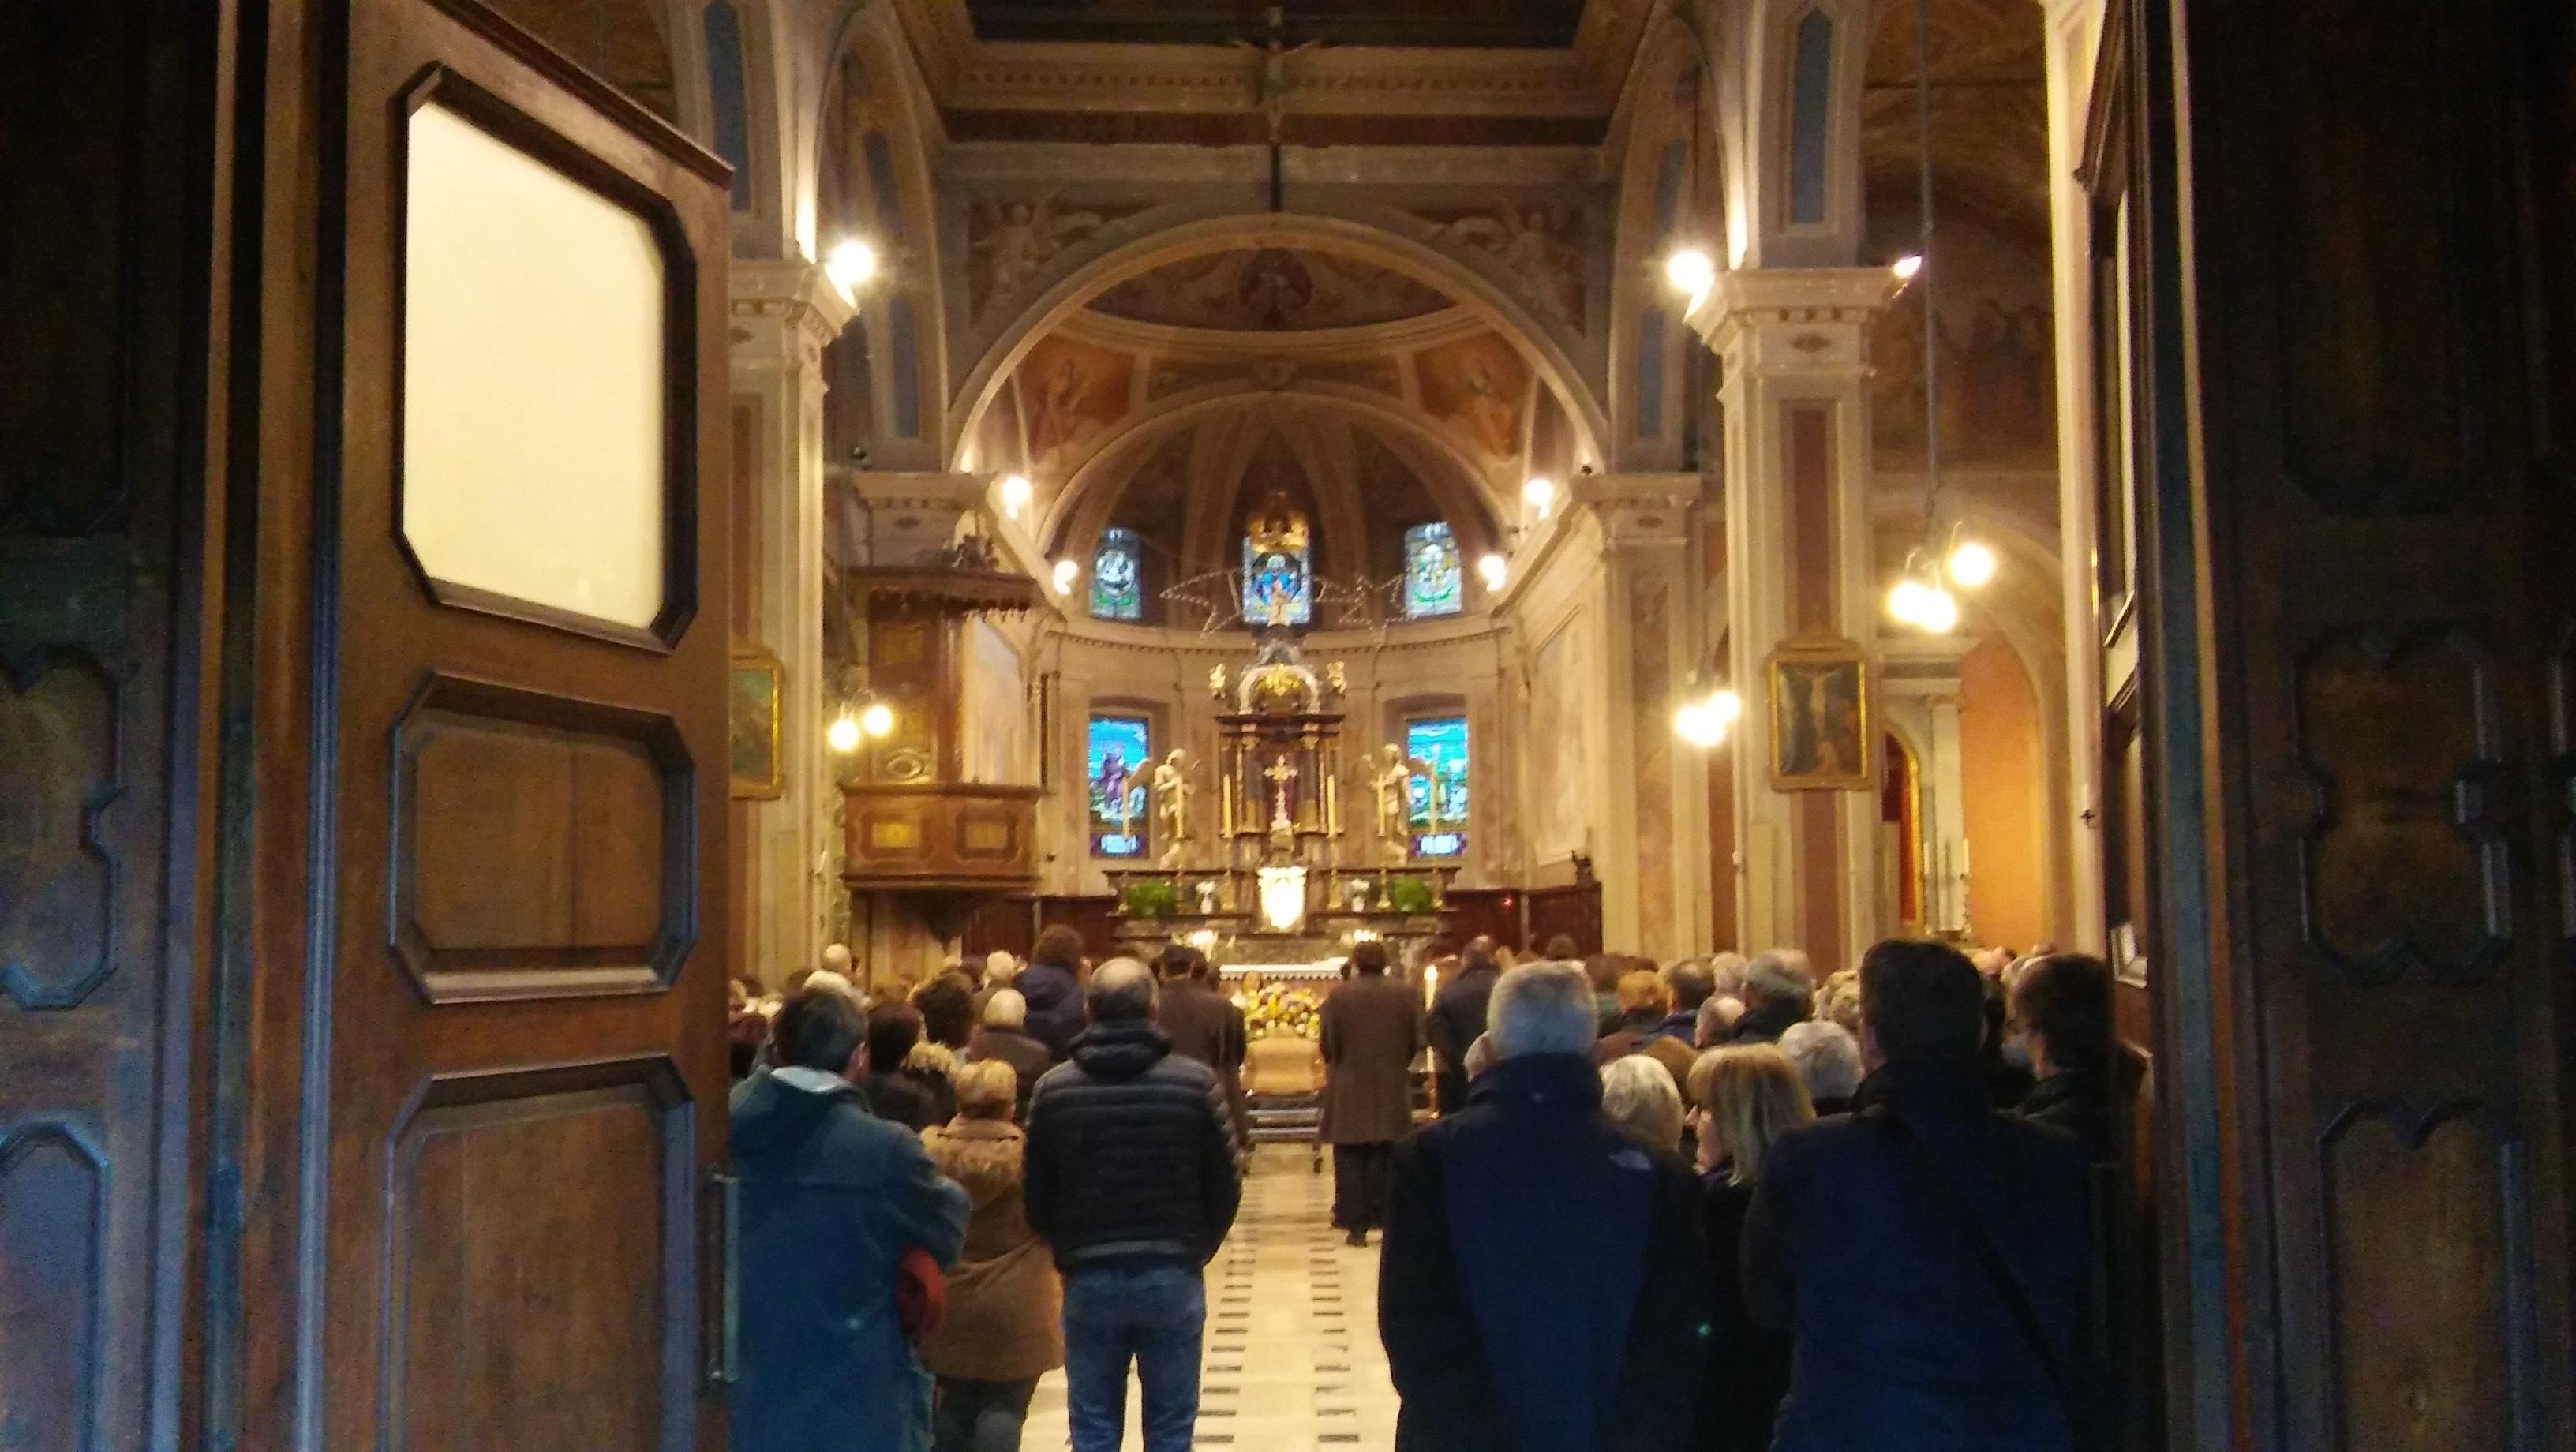 http://www.valsassinanews.com/wp-content/uploads/2017/12/Funerale-Sergio-Selva-4.jpg